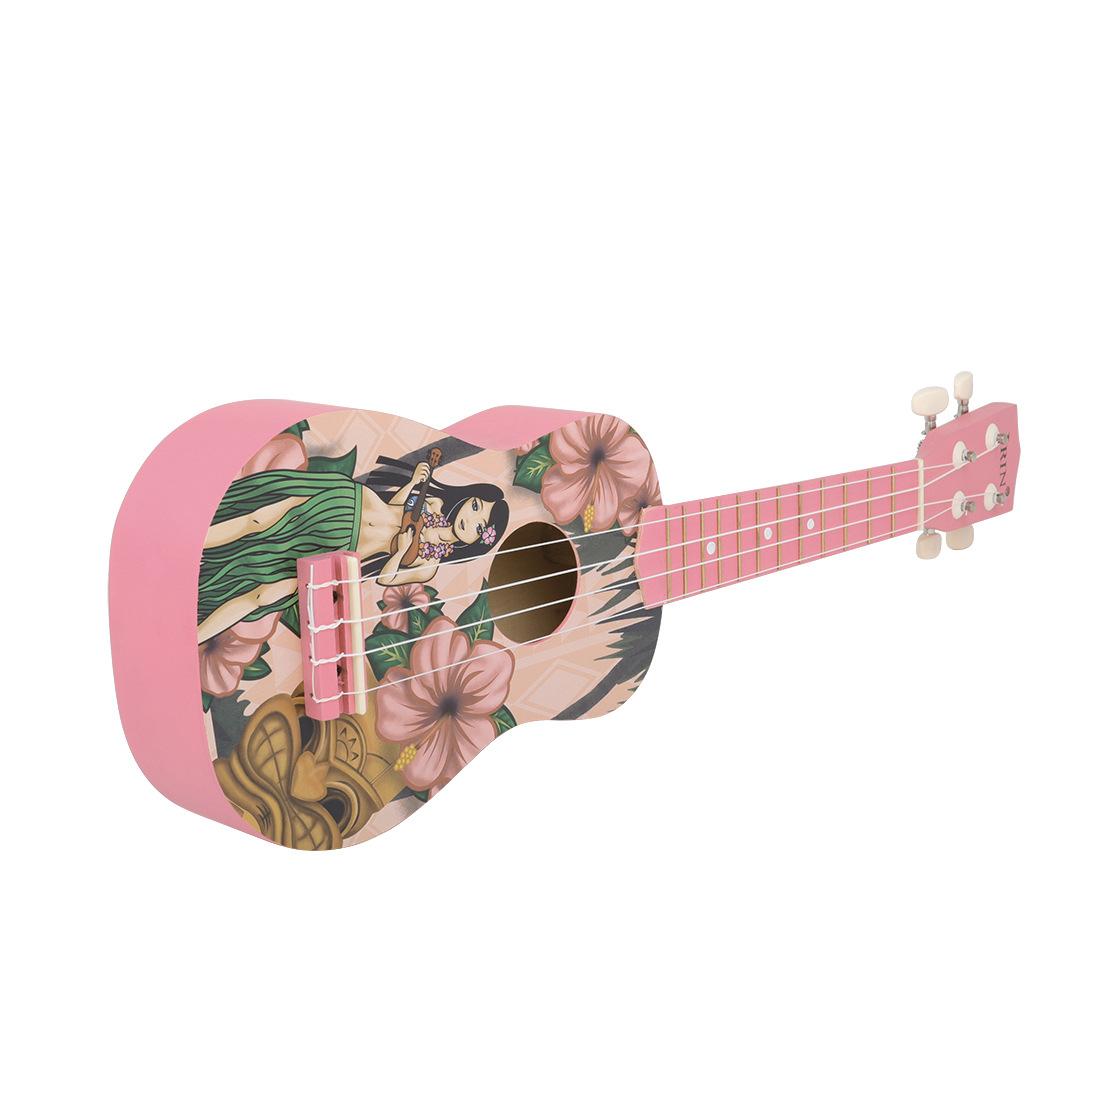 IRIN 21 Pink Inch Hawaiian Ukulele Four String Small Guitar Instrument For Girls 3